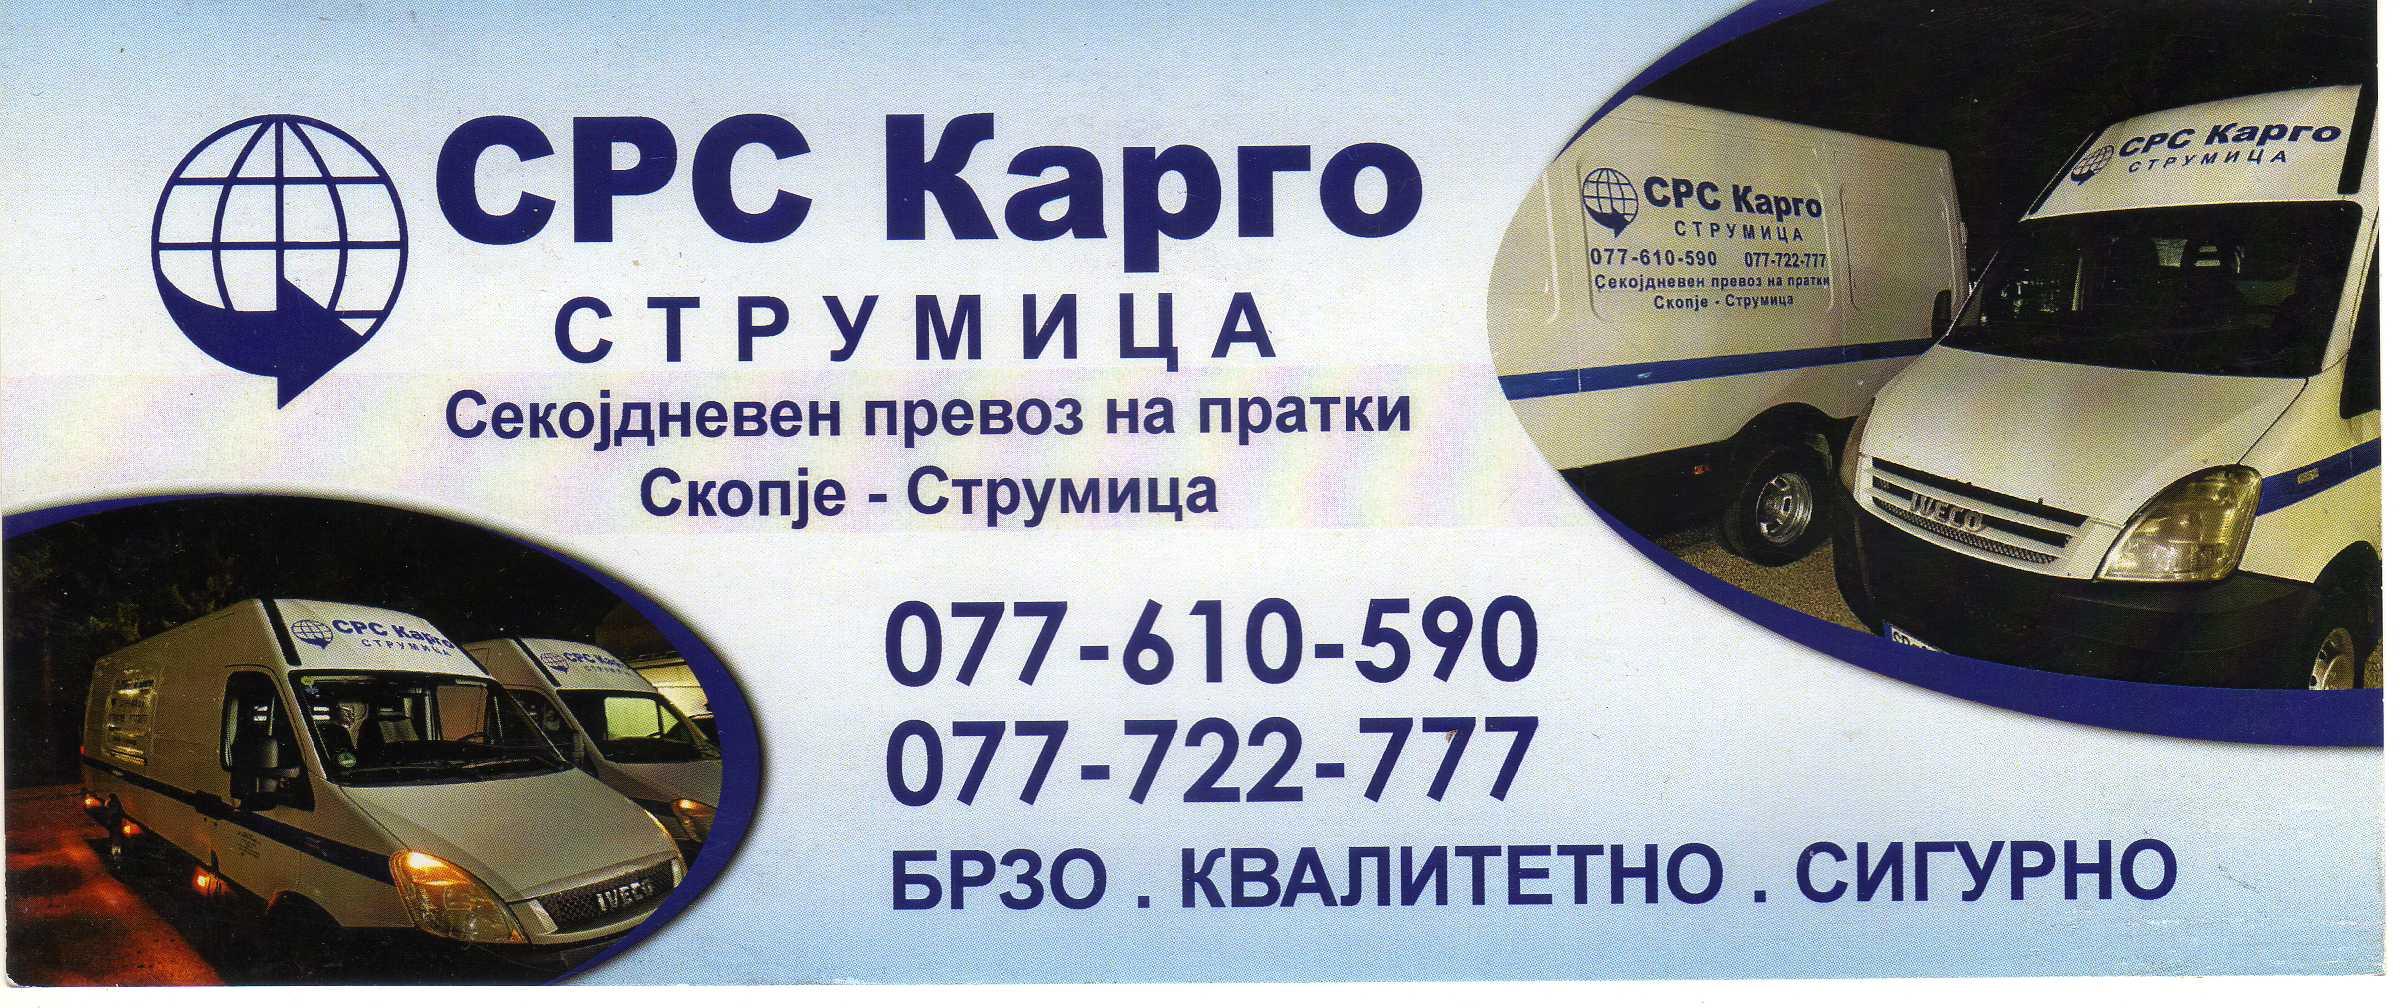 СРС Карго Струмица